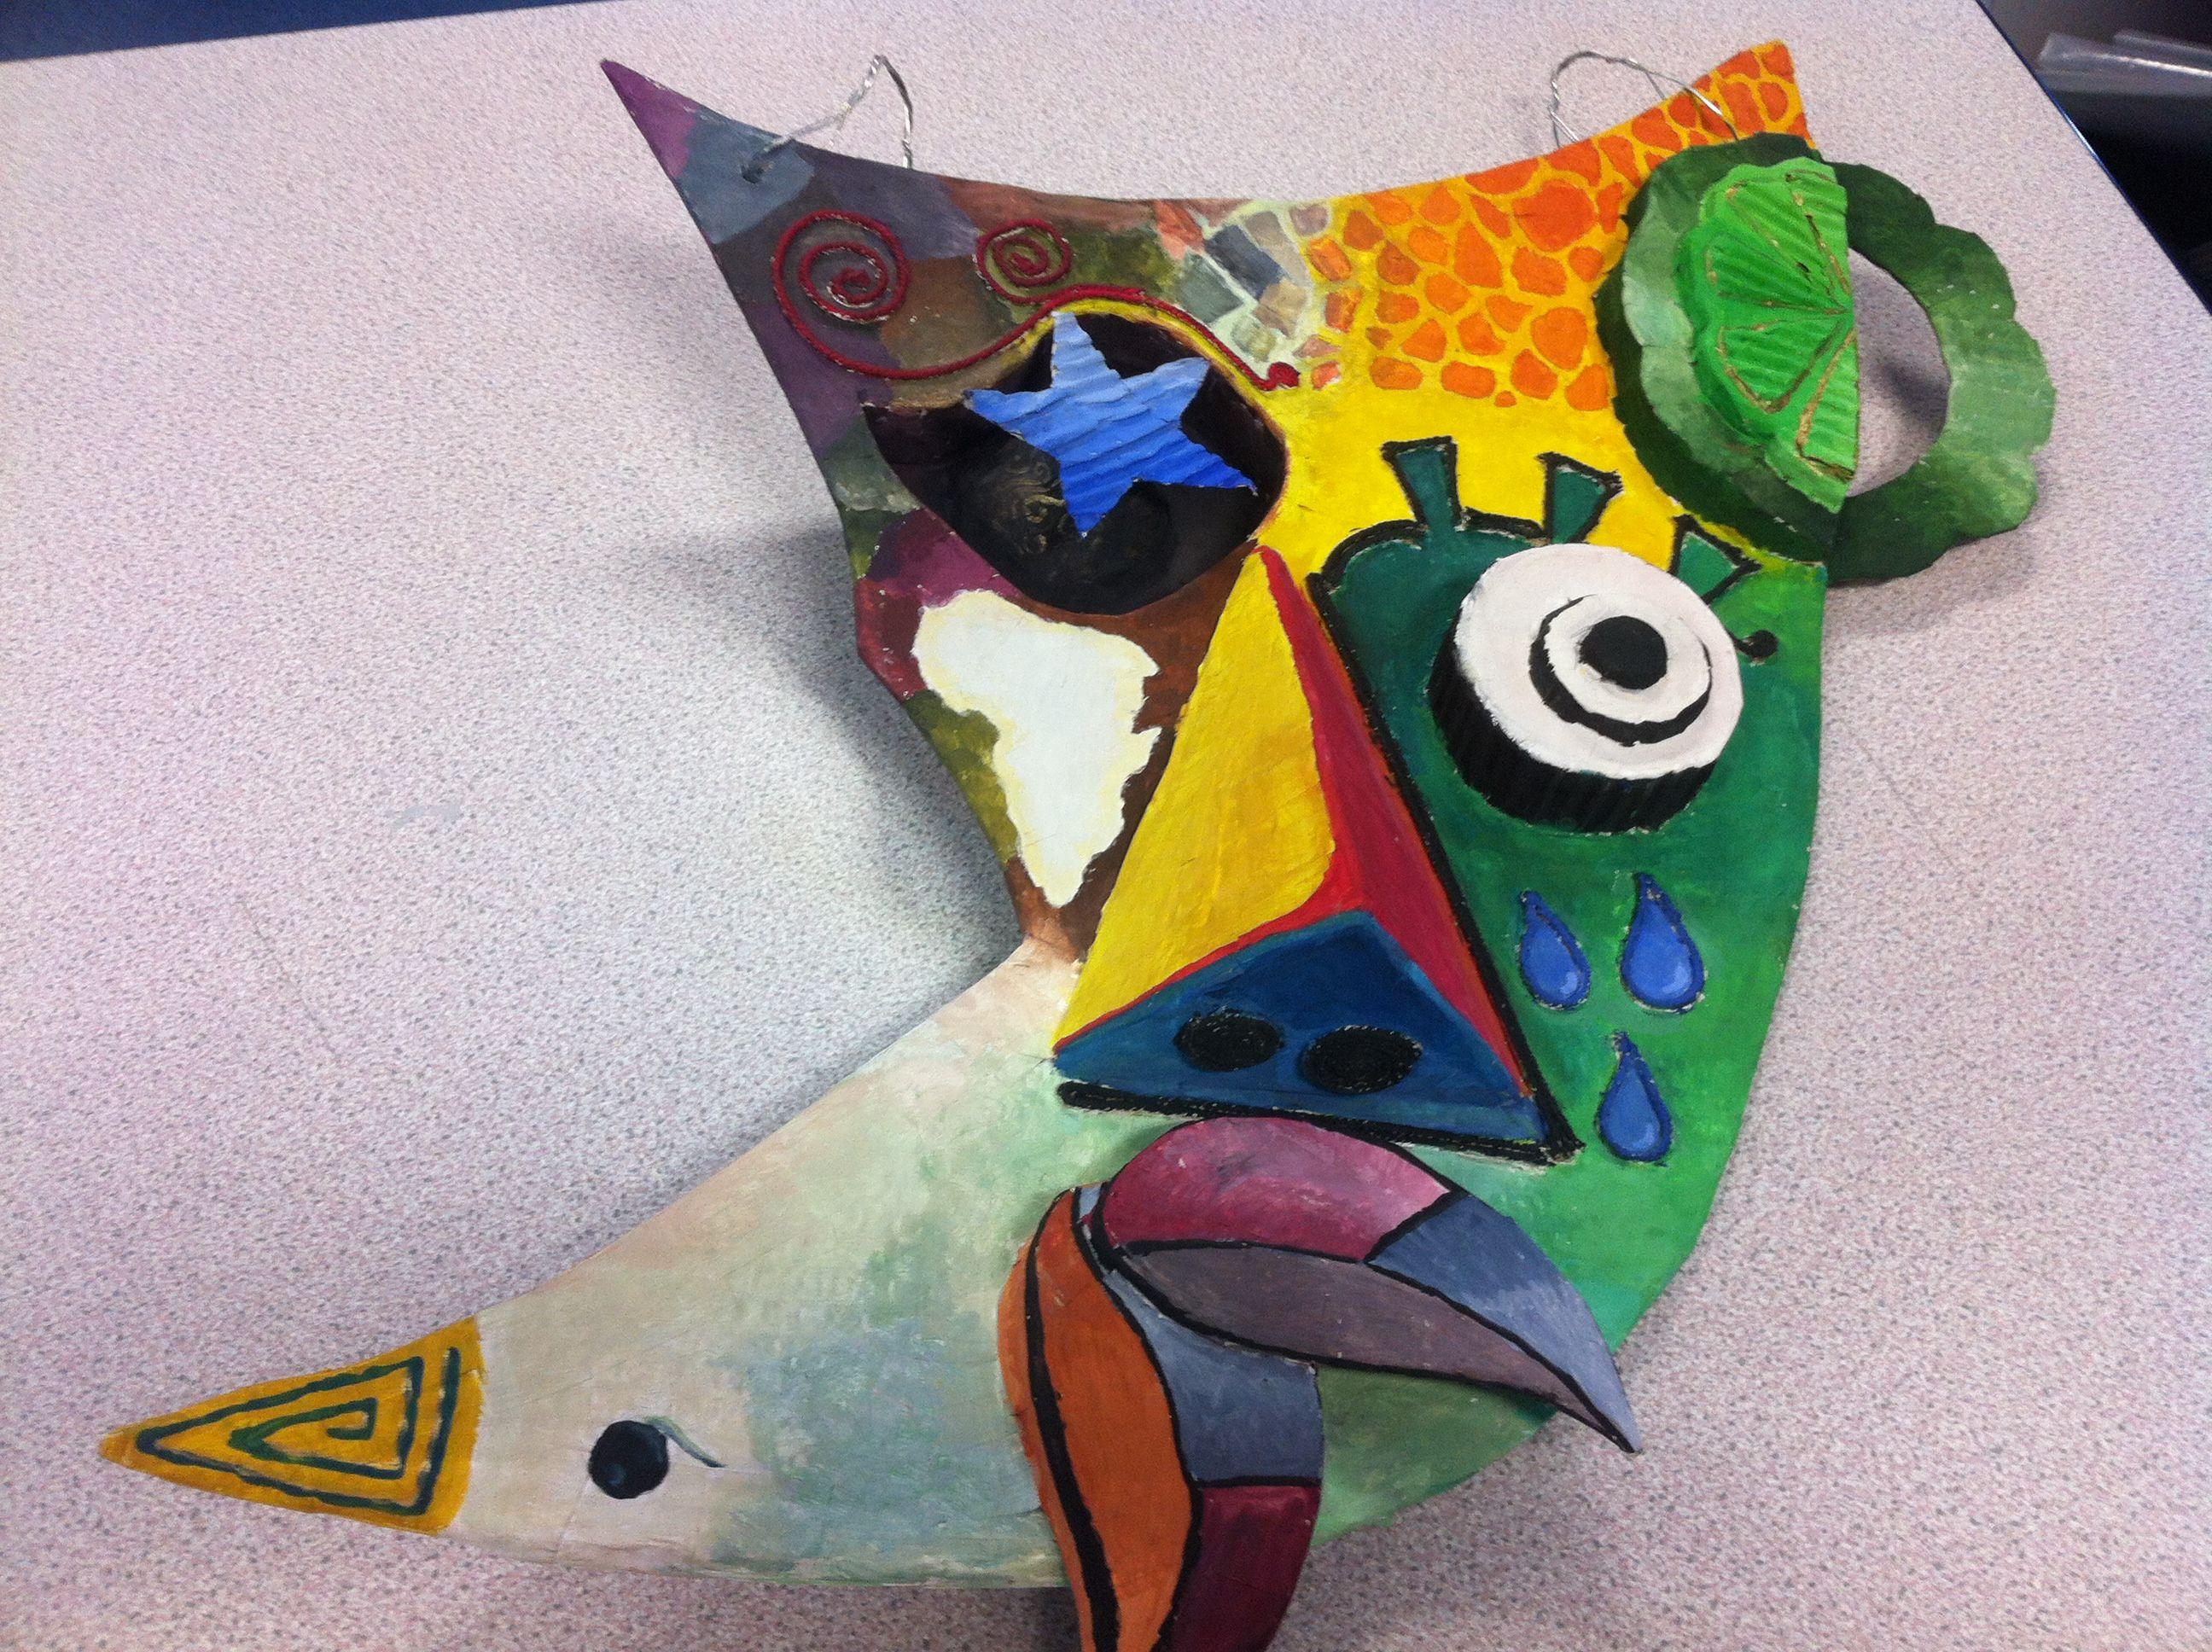 Picasso Influence